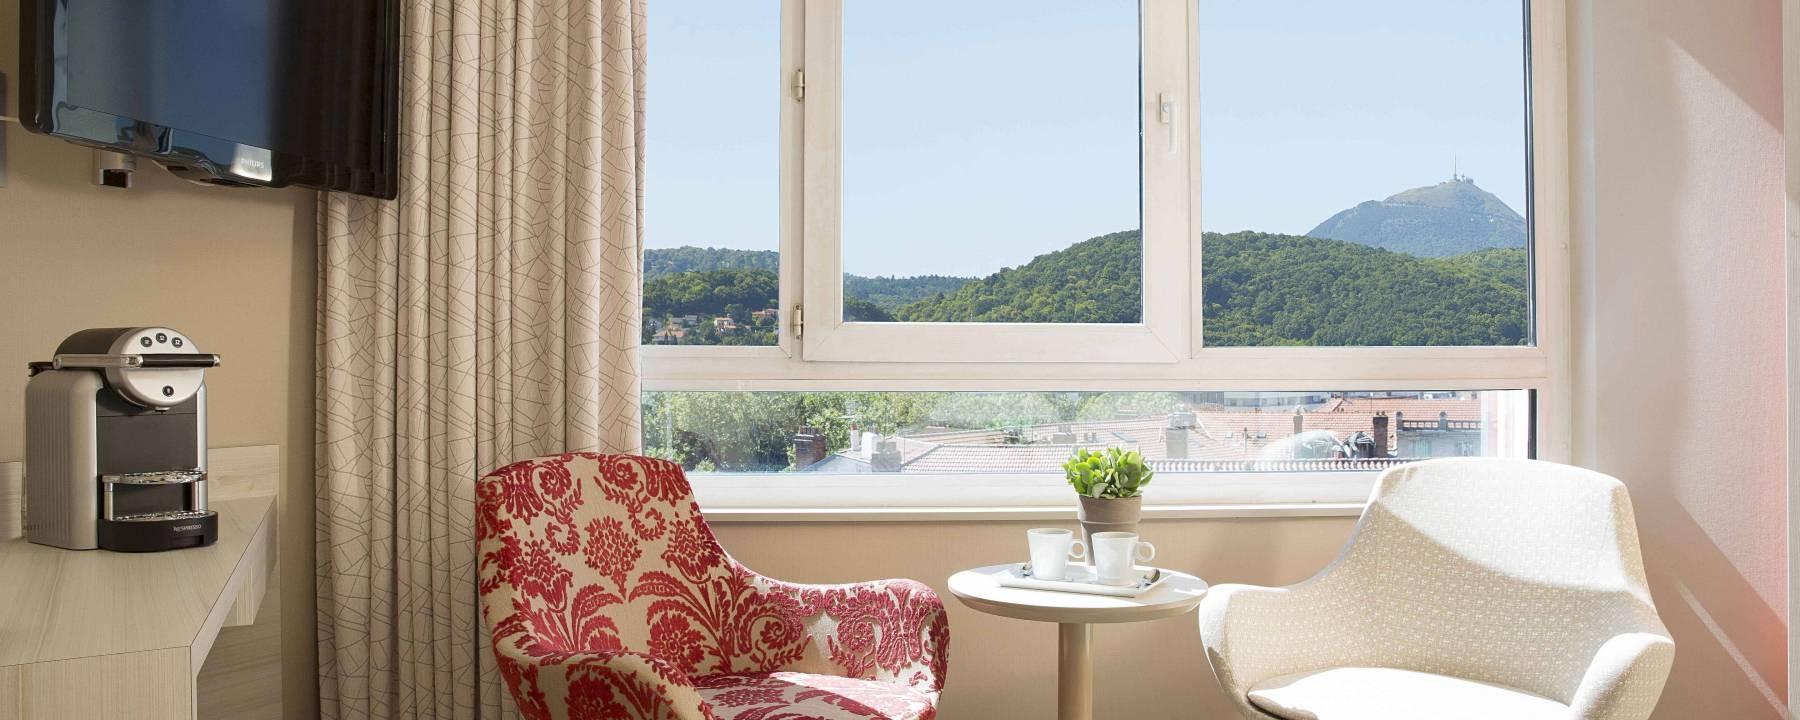 Chambre - Hotel Oceania Clermont ferrand 4 etoiles (6).jpg